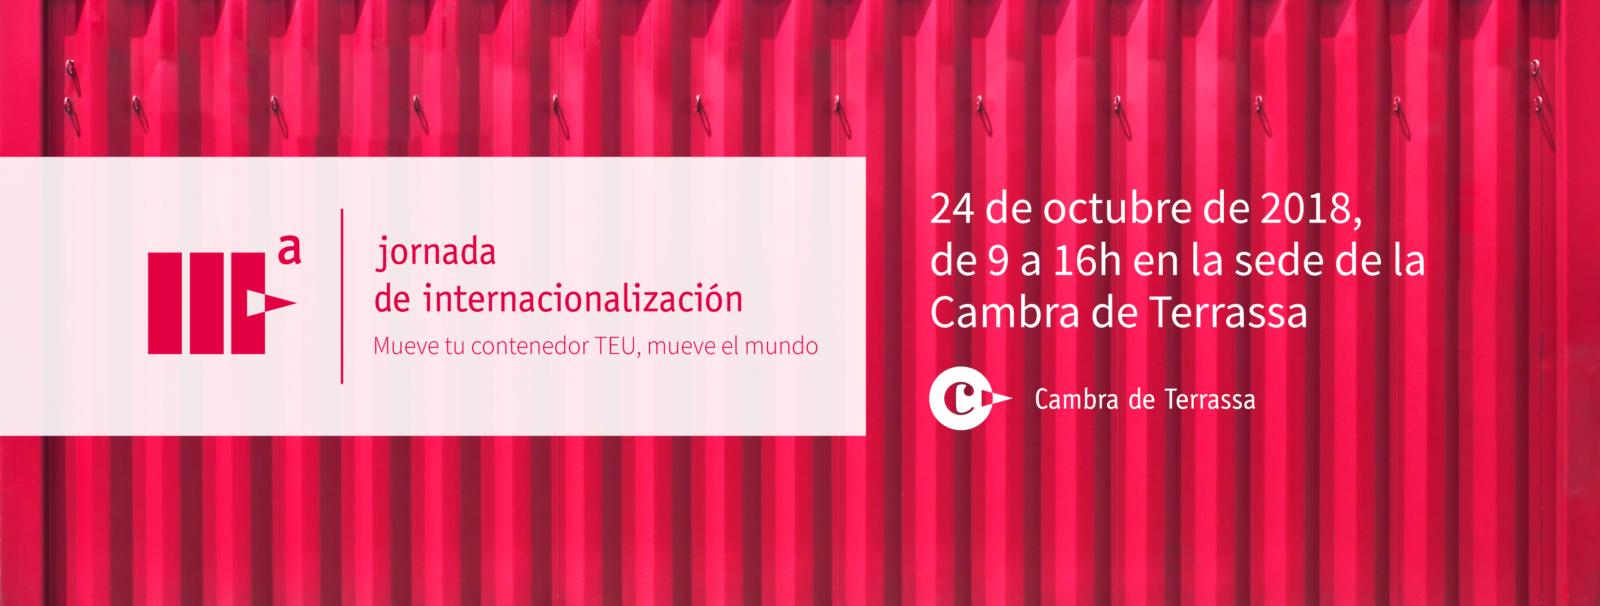 Programa_jornada_ internacionalitzacio¦ü_CAST_DIGITAL-01